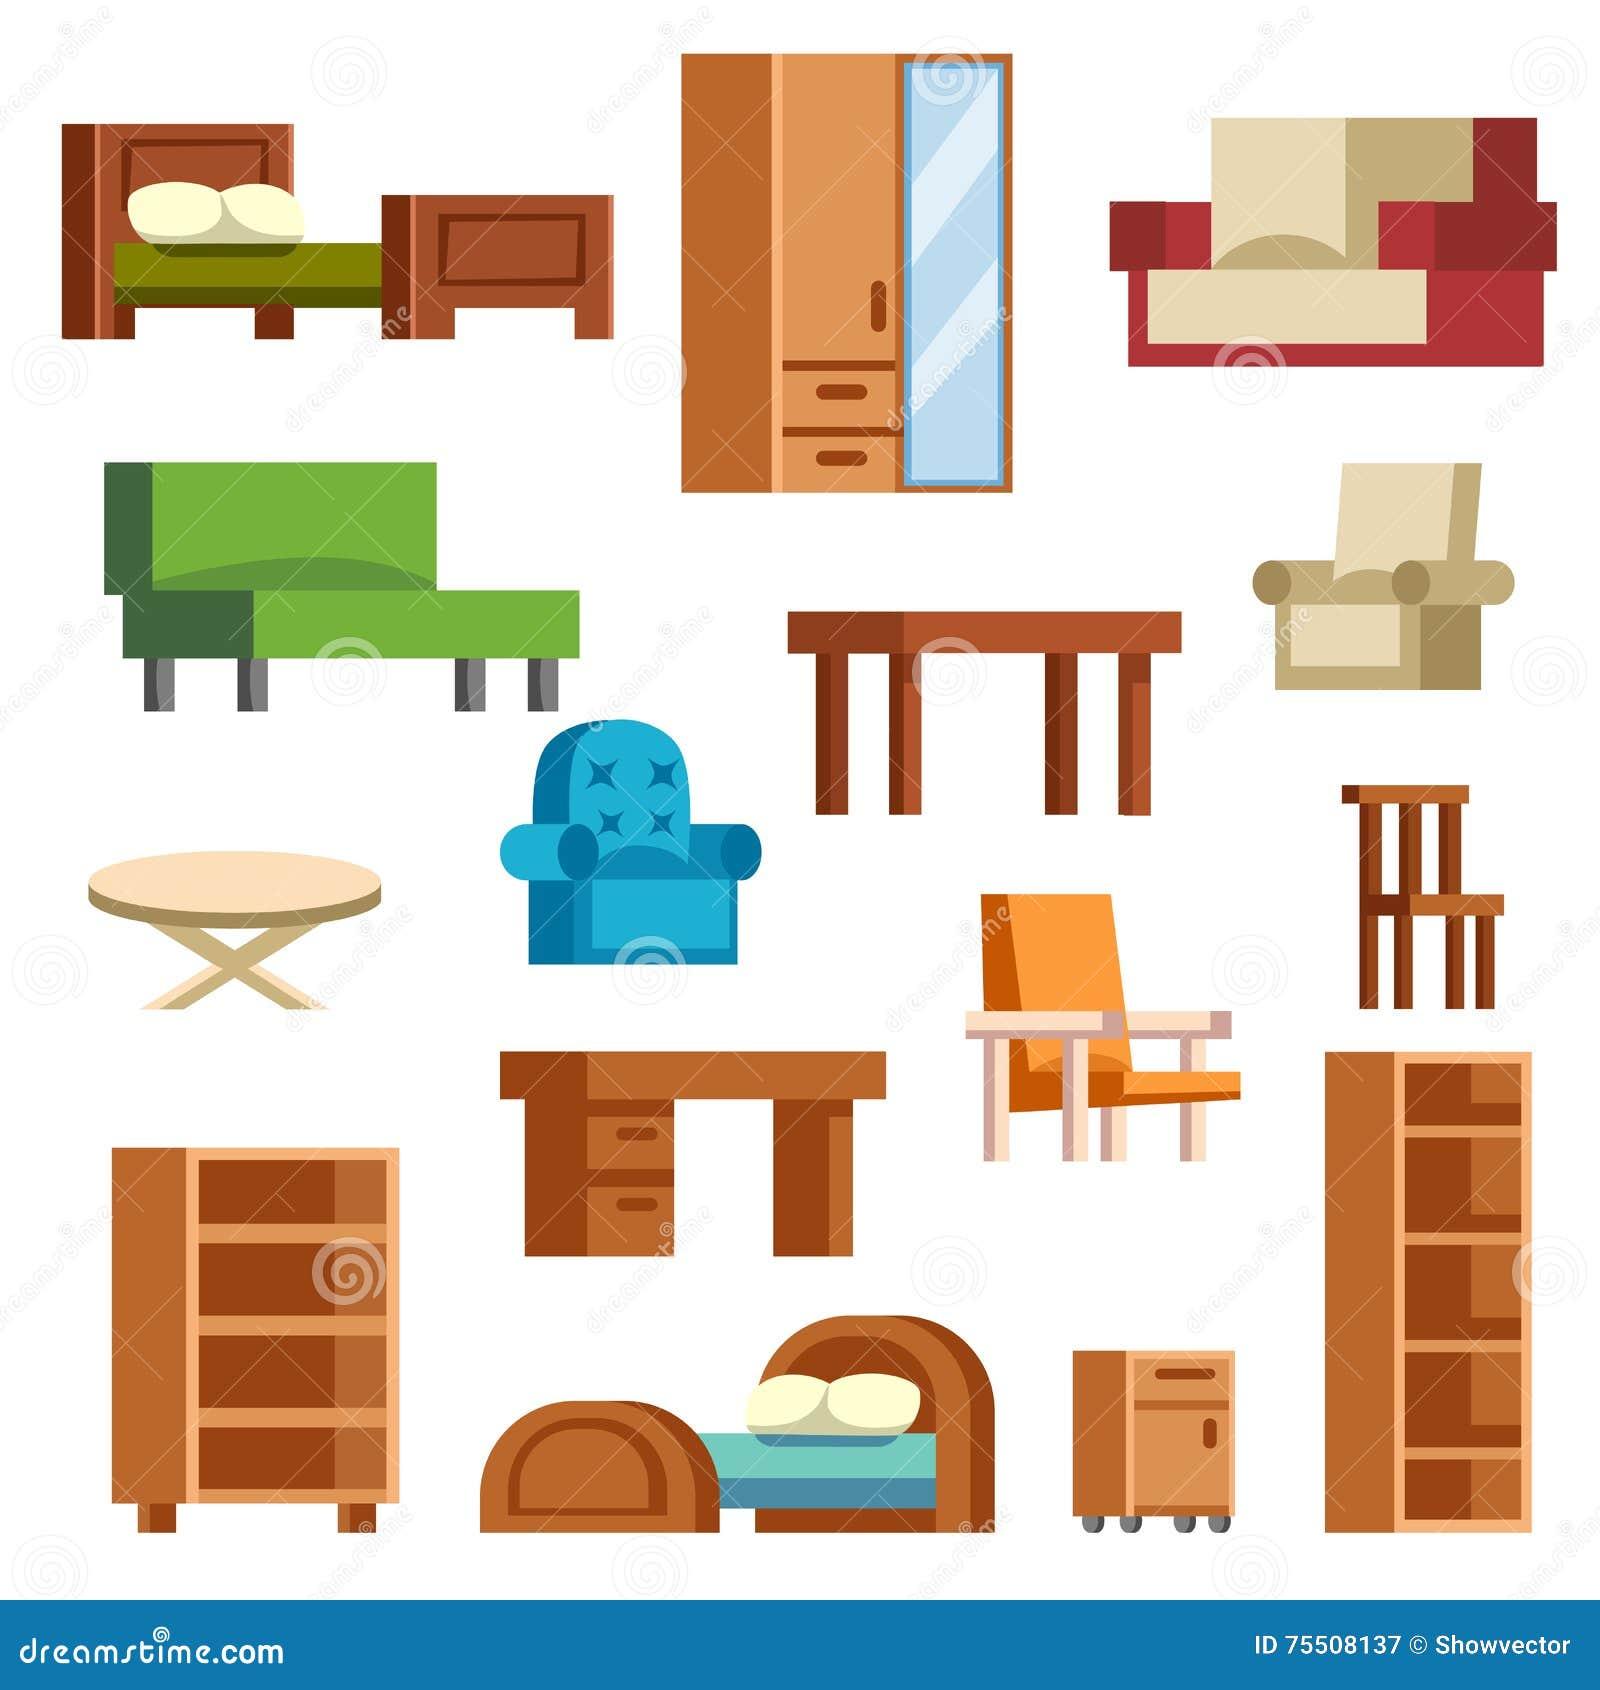 Modern Classroom Vector : Cupboard cartoons illustrations vector stock images